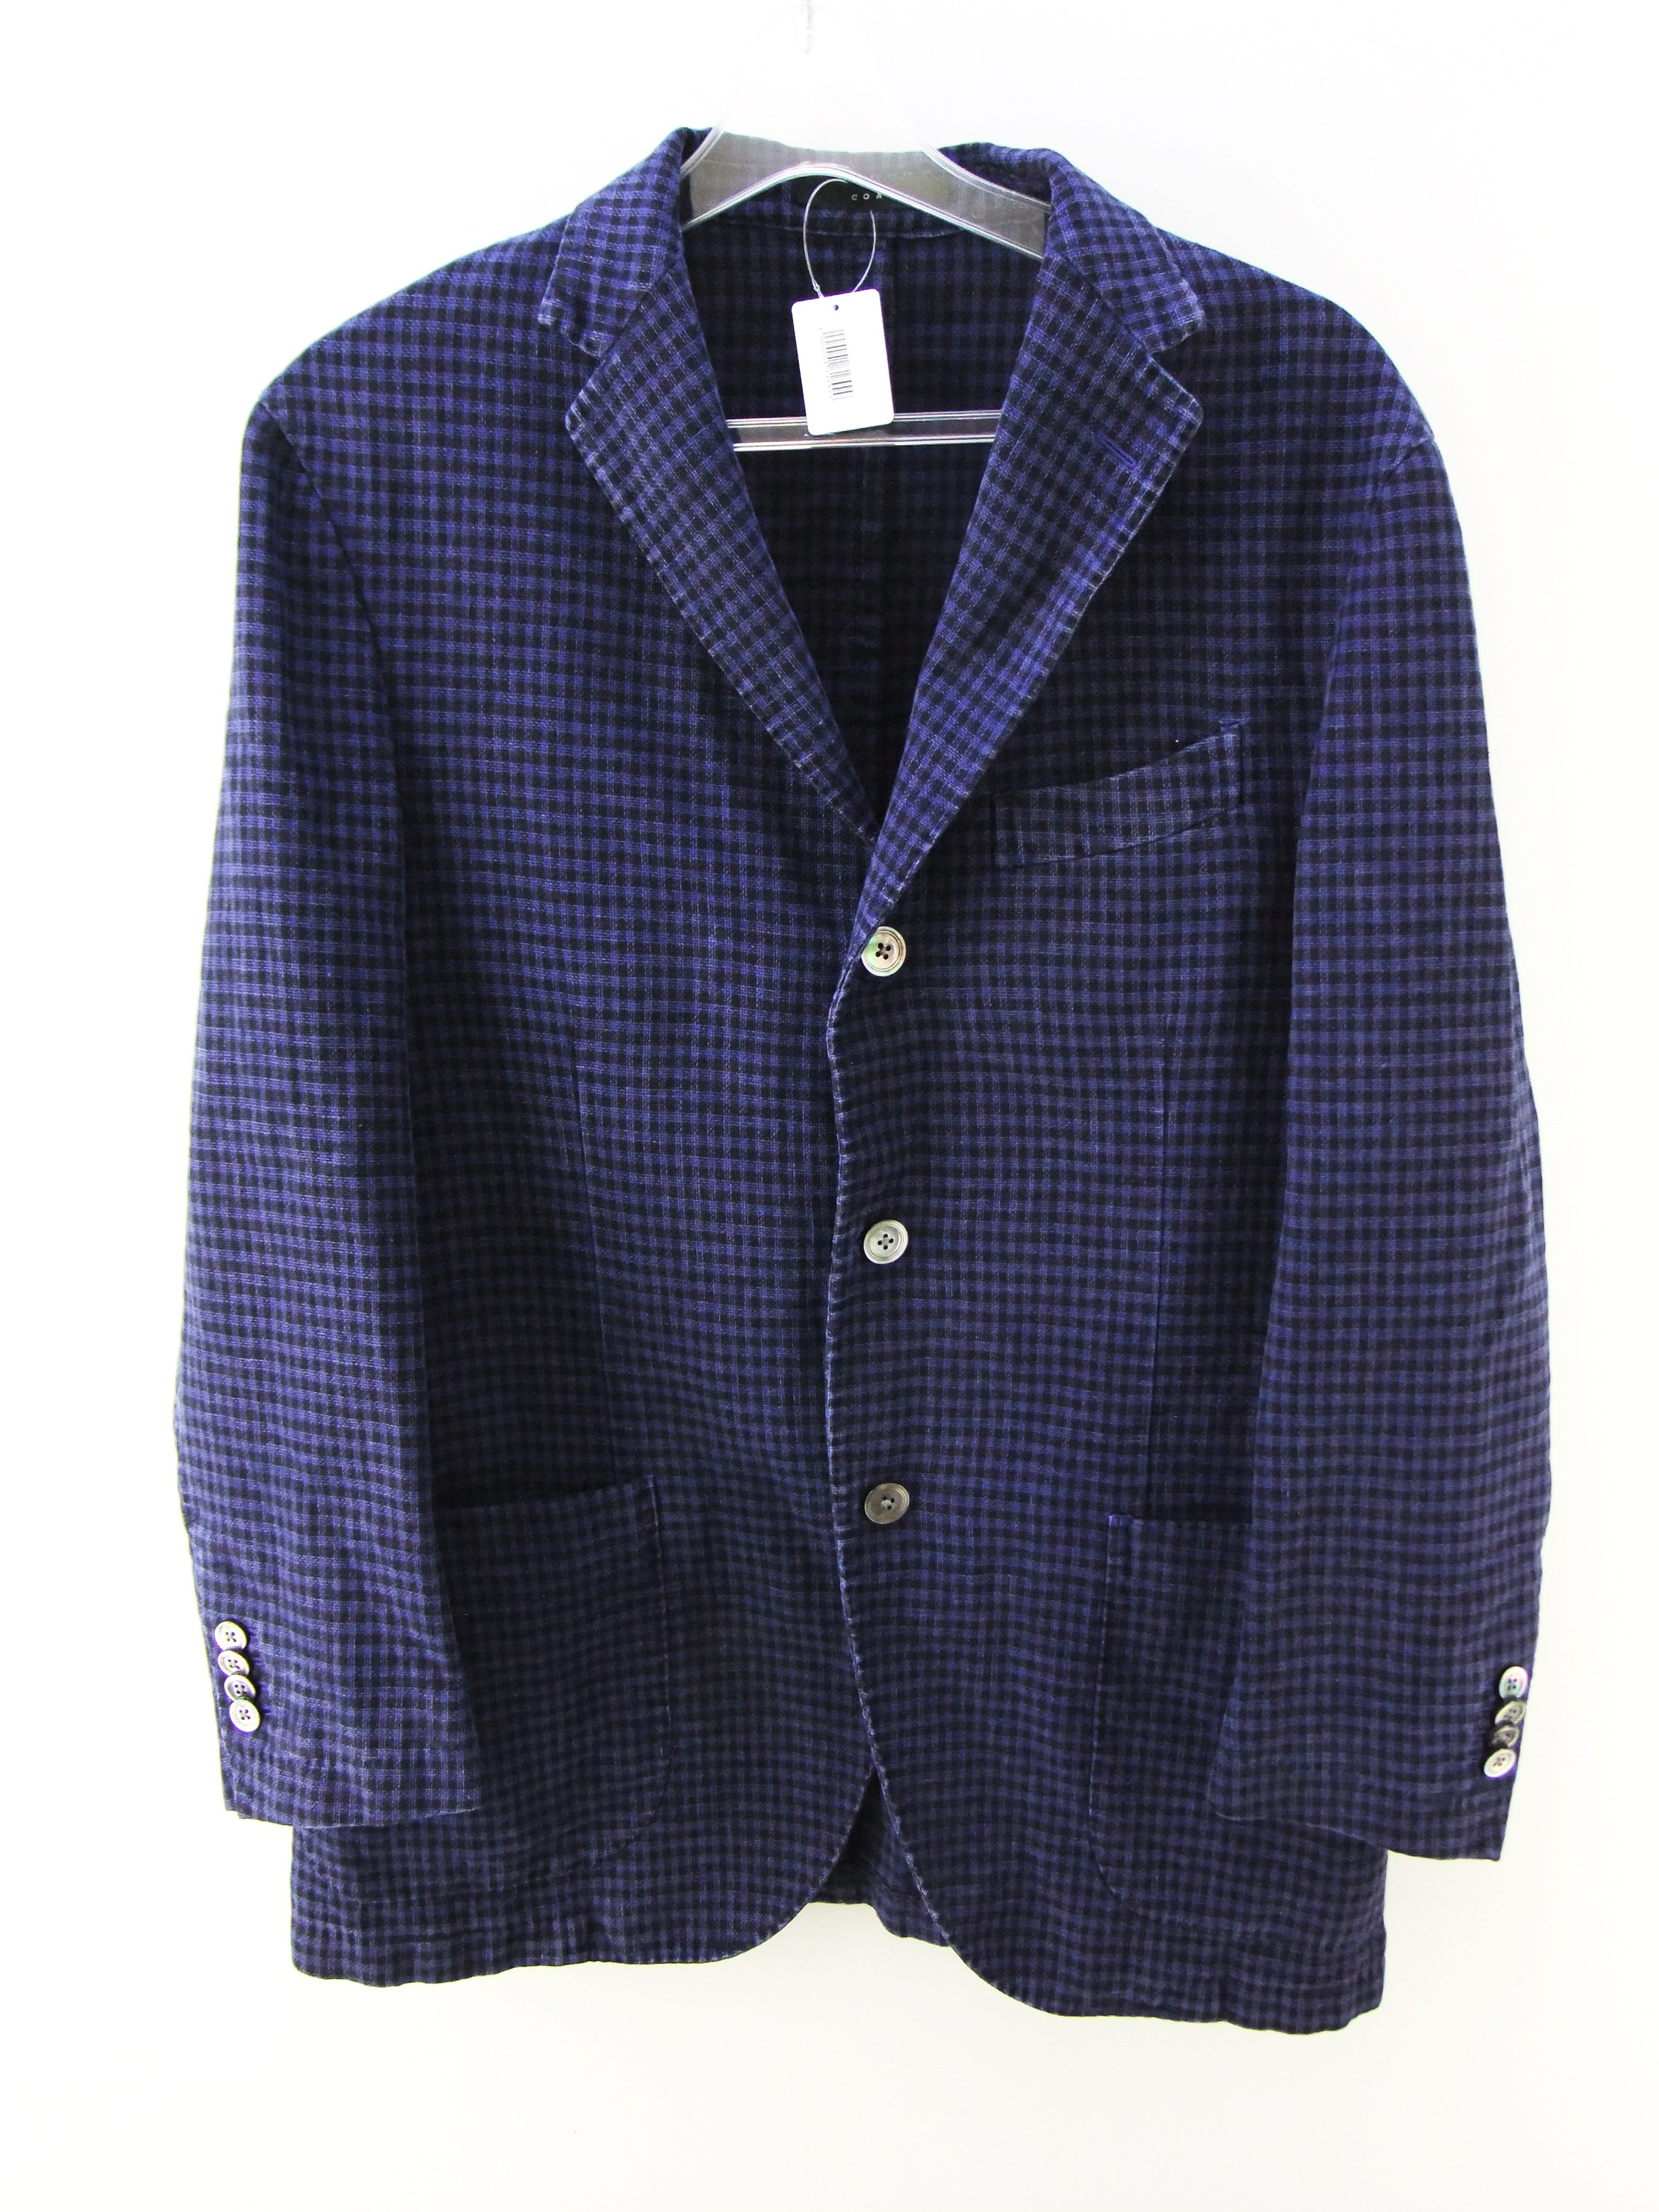 ■ BOGLIOLI COAT ボリオリ ジャケット  48 ブルー # 1000001618999 【中古】